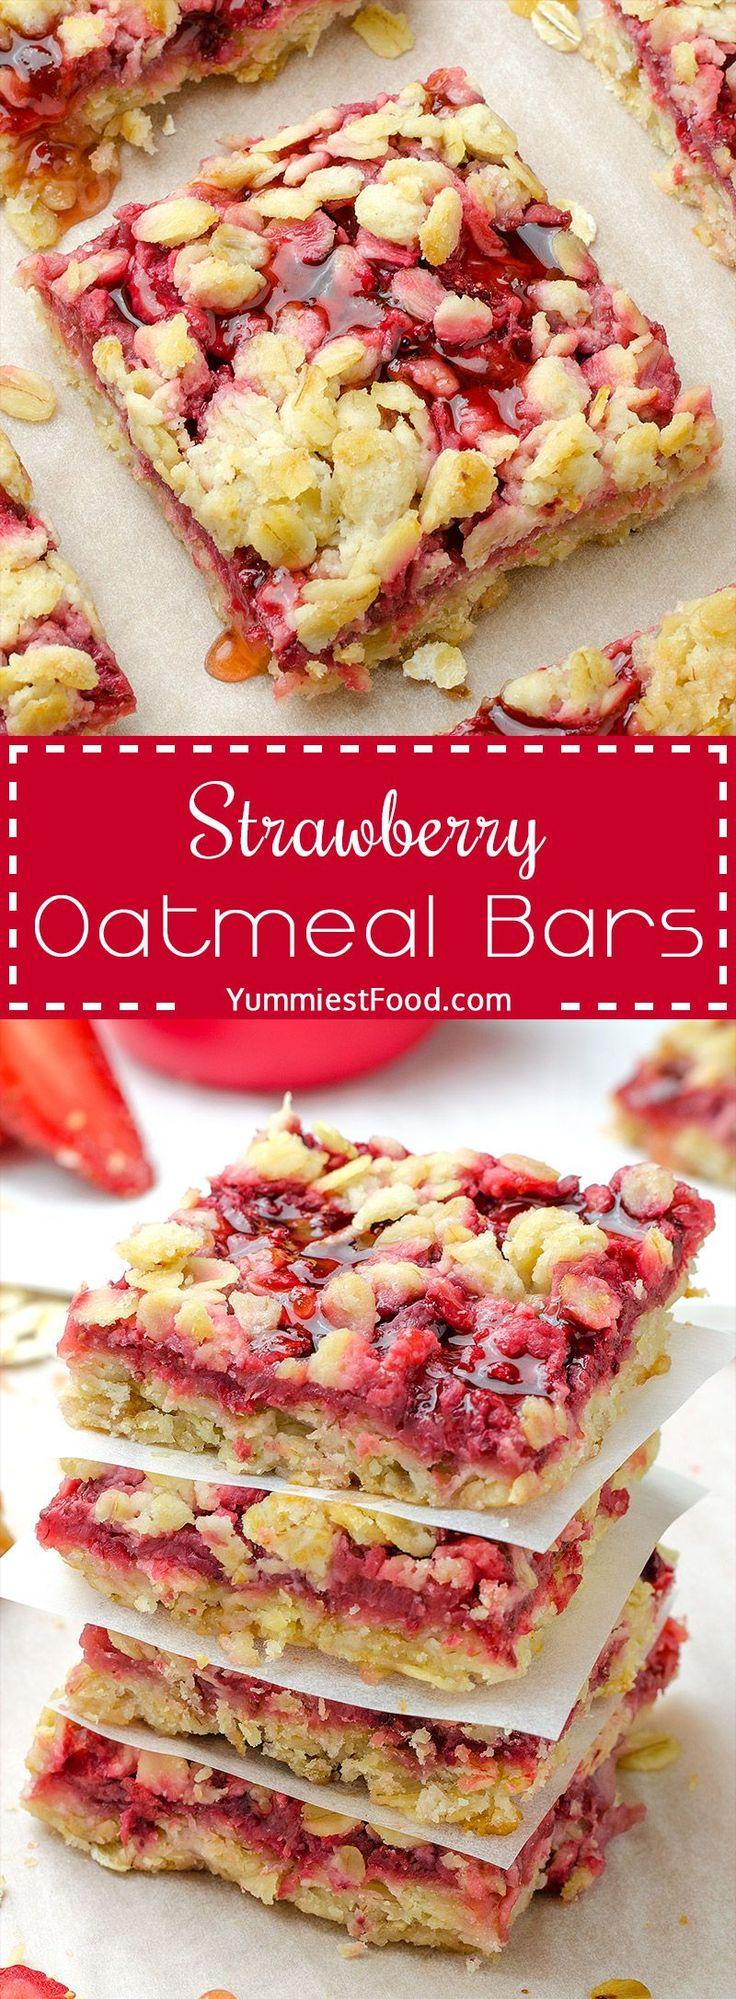 Healthy Breakfast Strawberry Oatmeal Bars These Ma…